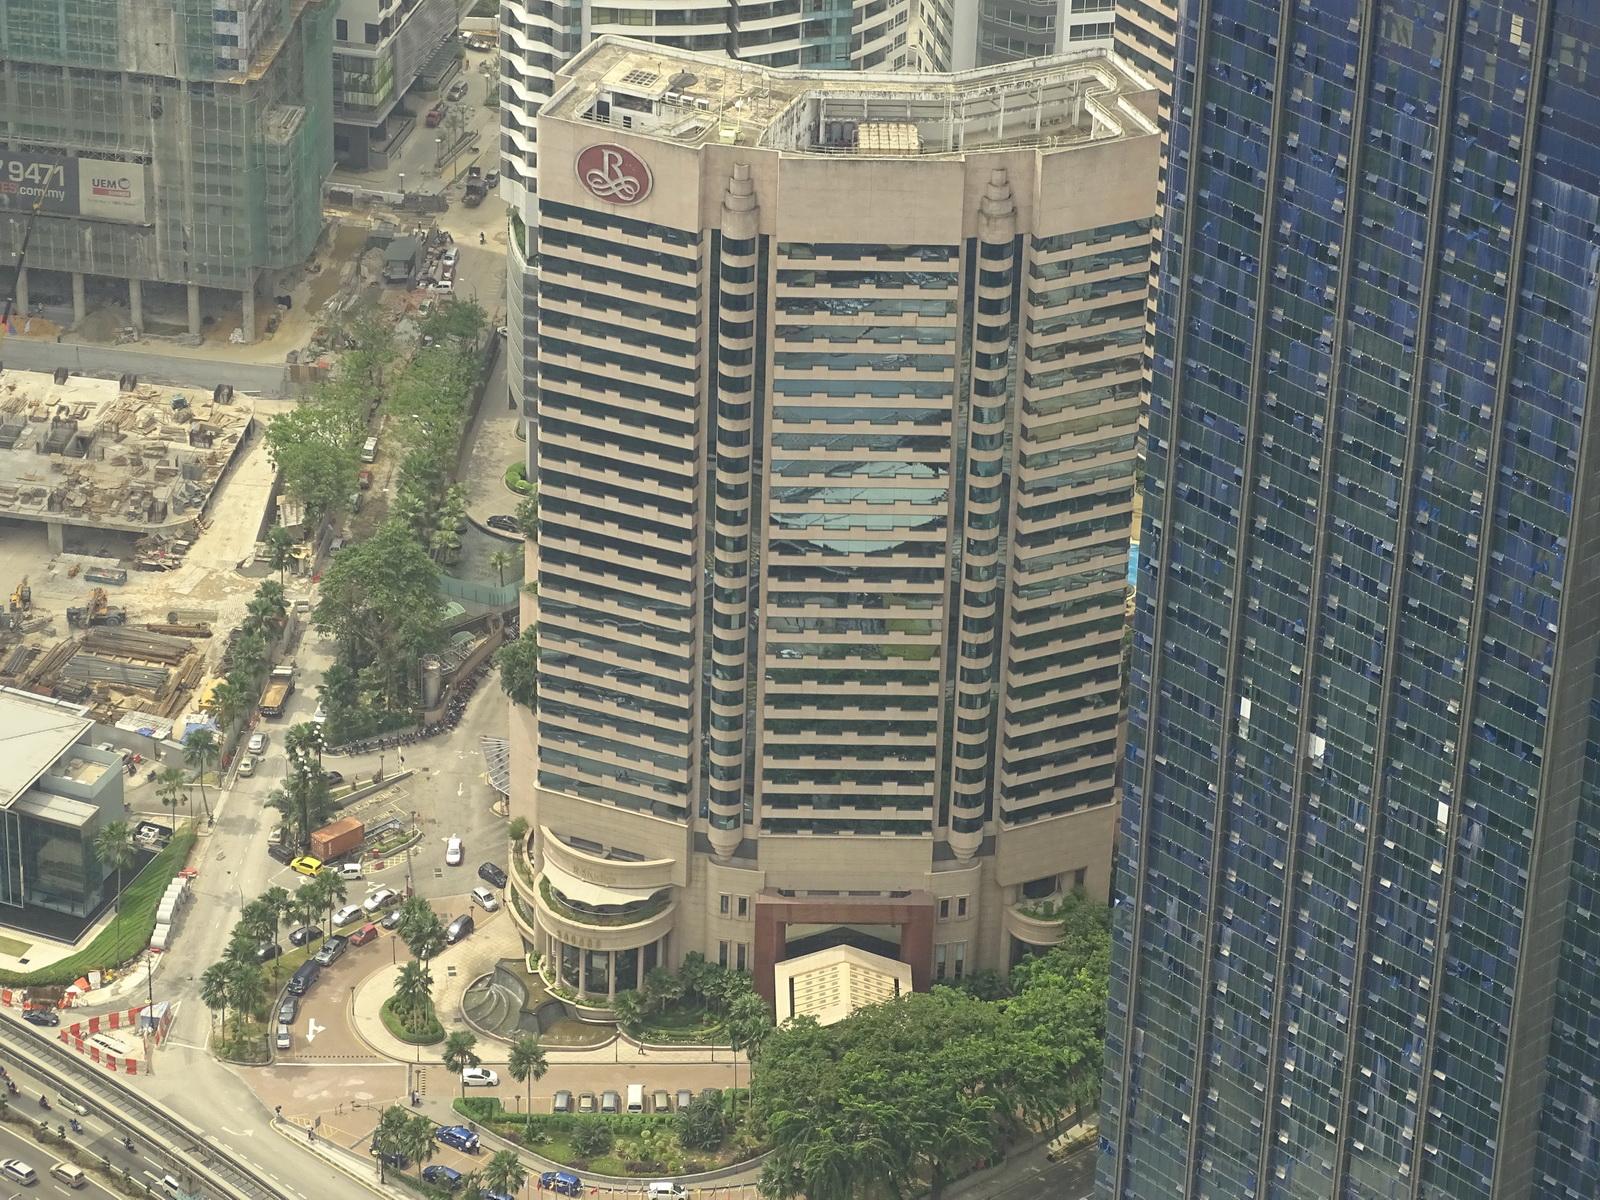 05 KL Tower 33